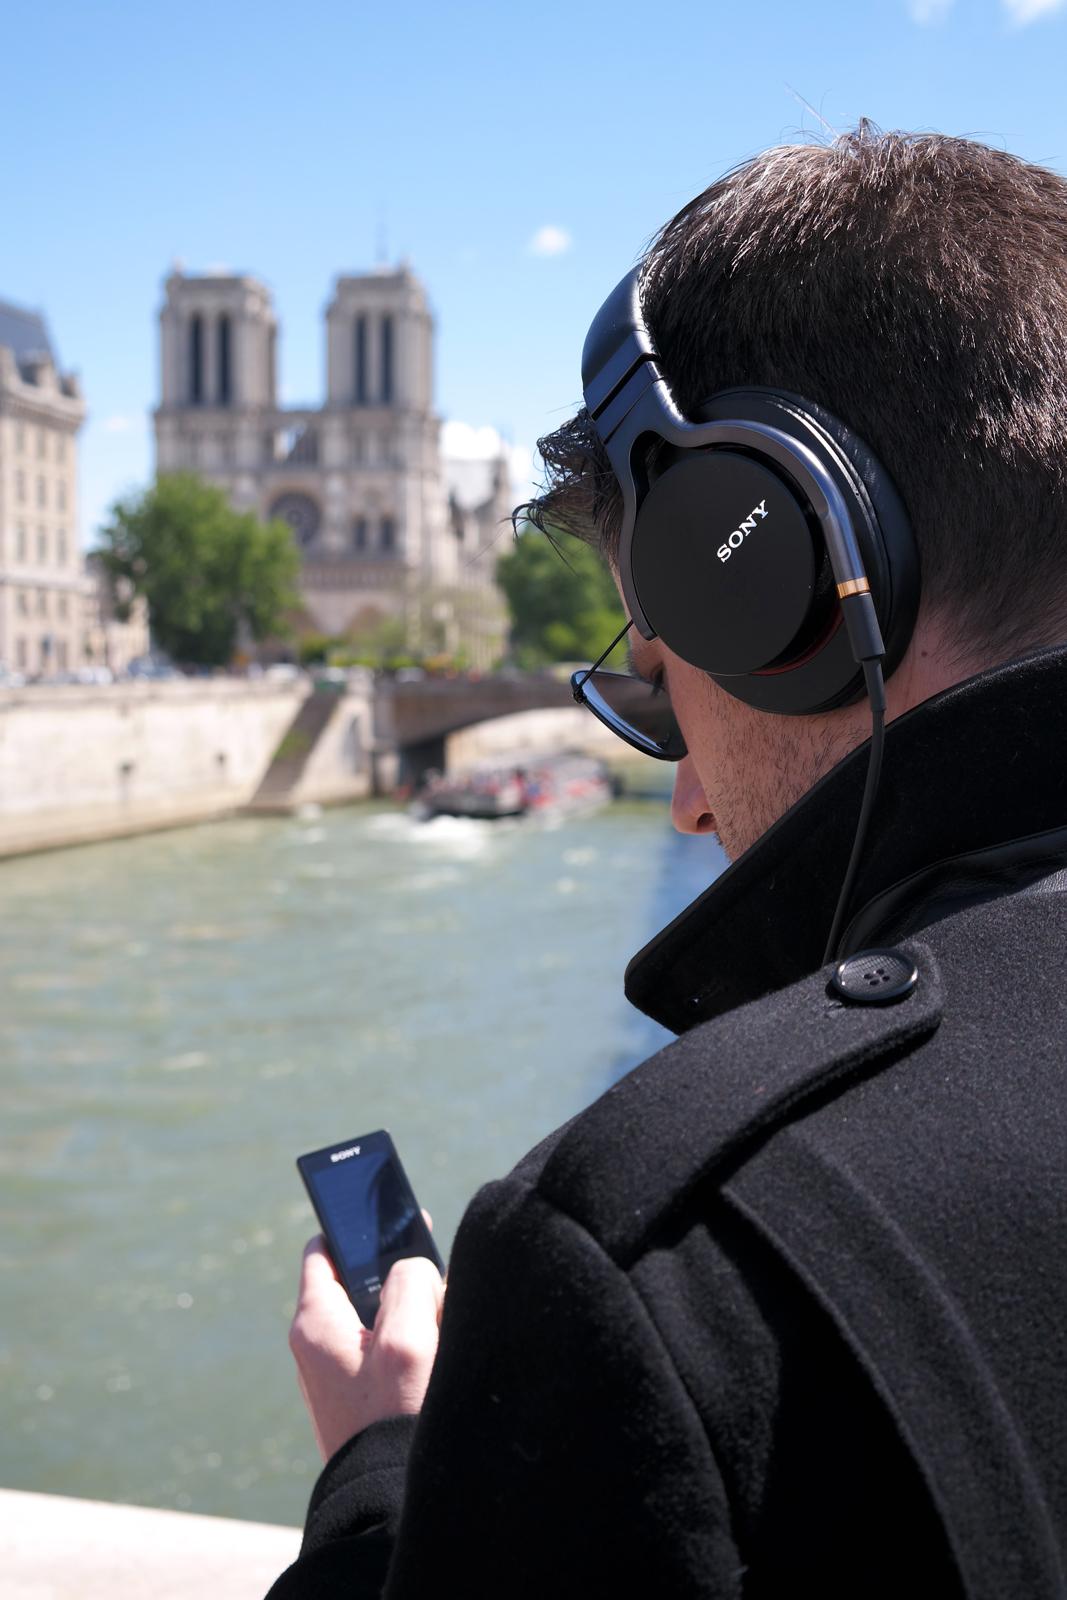 Sony casque MDR 1A Walkman NWZ A15 musique MP3 radio nomade technologie nouveauté innovation test critique avis revue Photo by United States Of Paris